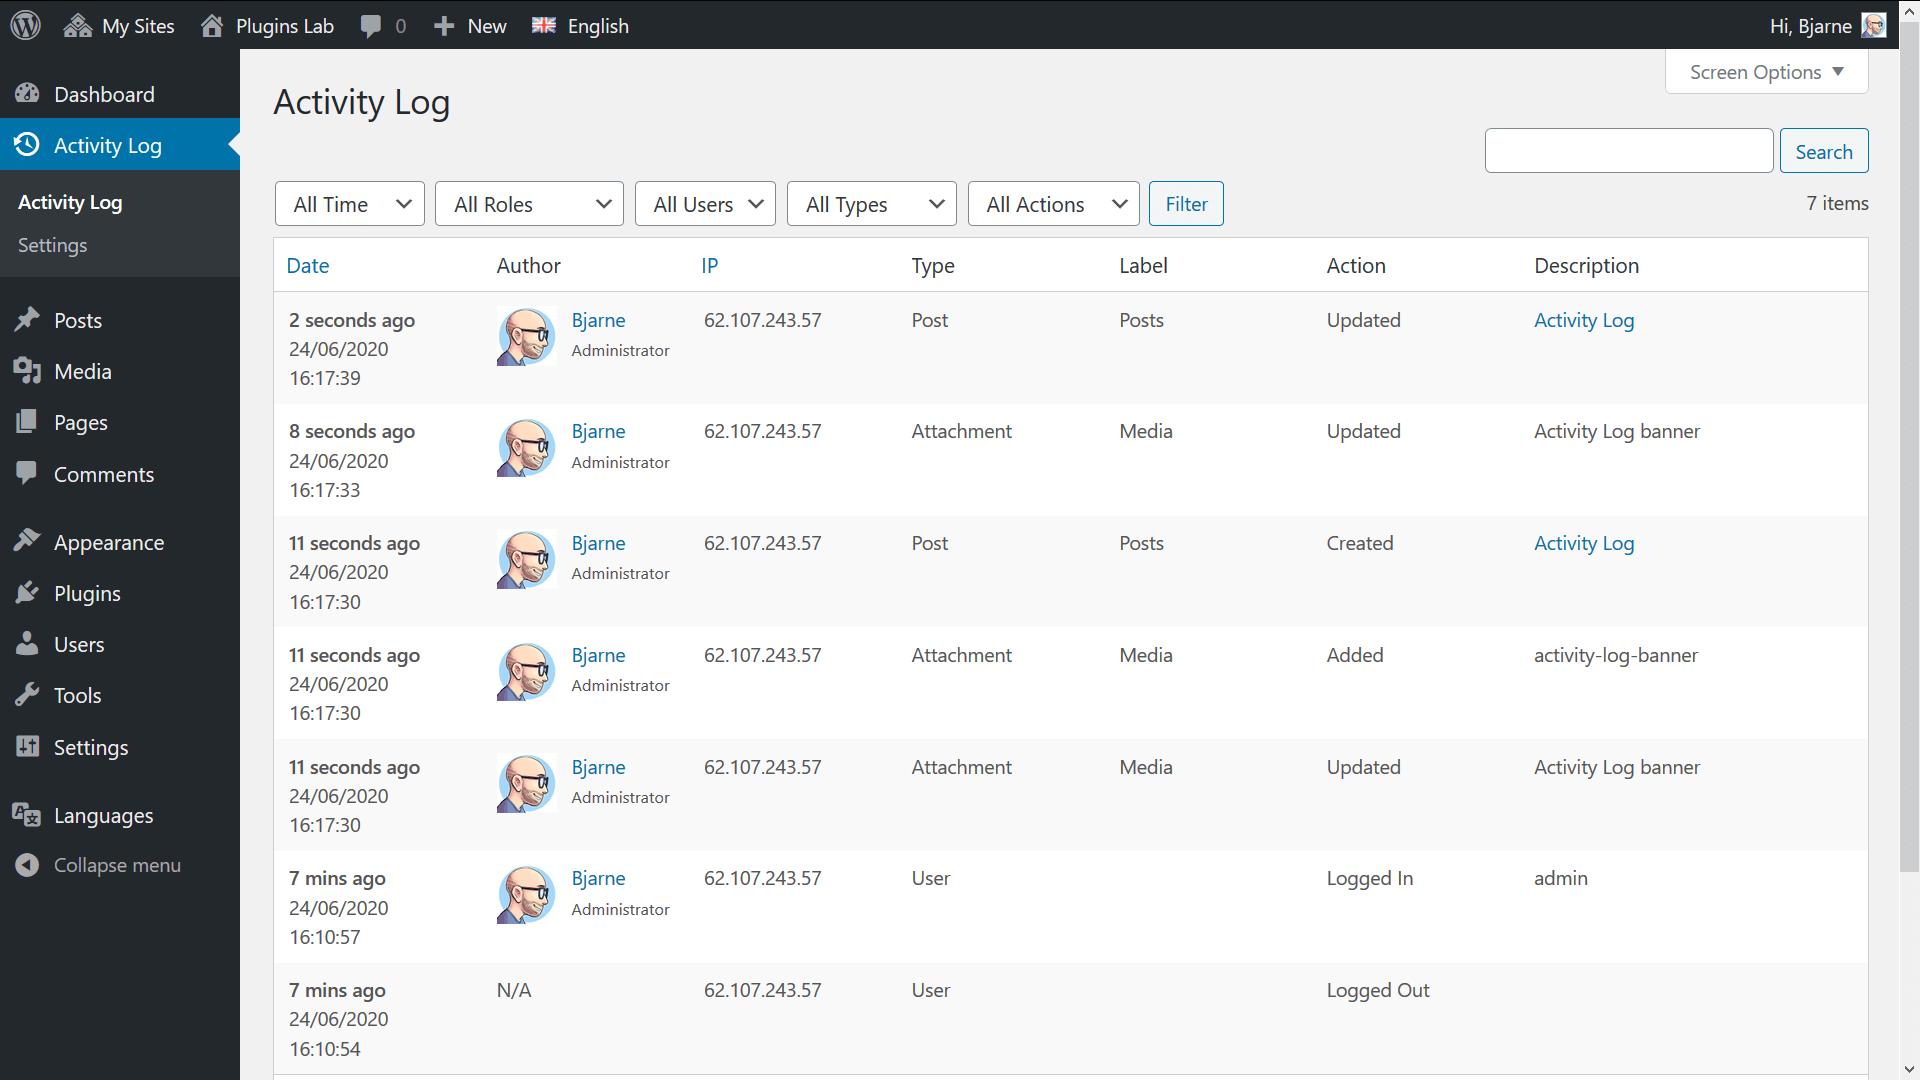 Activity Log screenshot